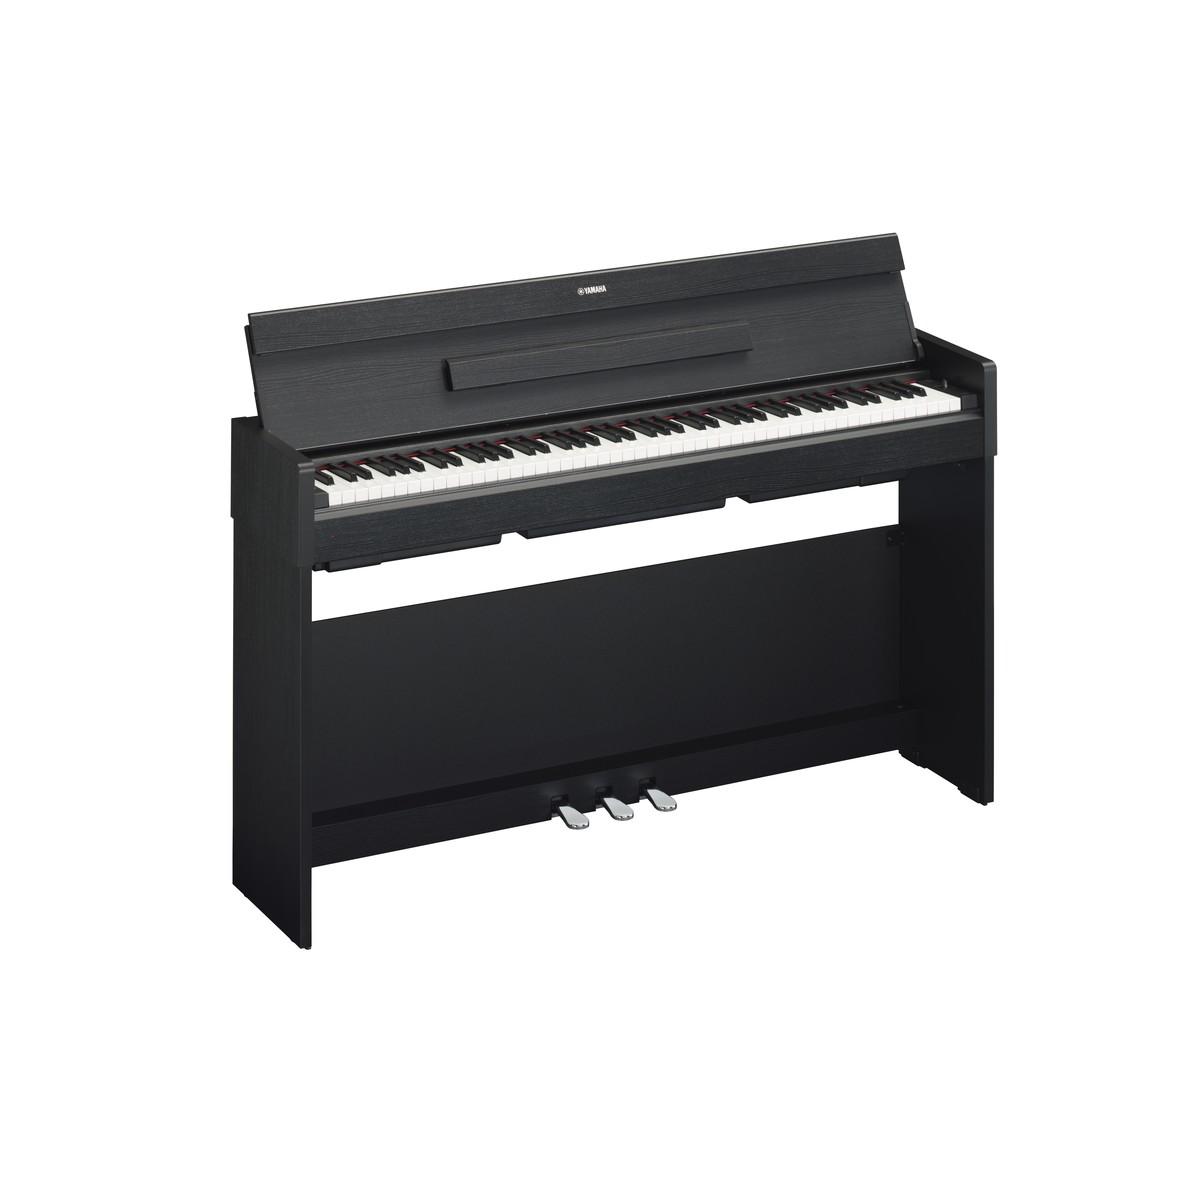 yamaha ydp s34 digital piano package black walnut at gear4music. Black Bedroom Furniture Sets. Home Design Ideas